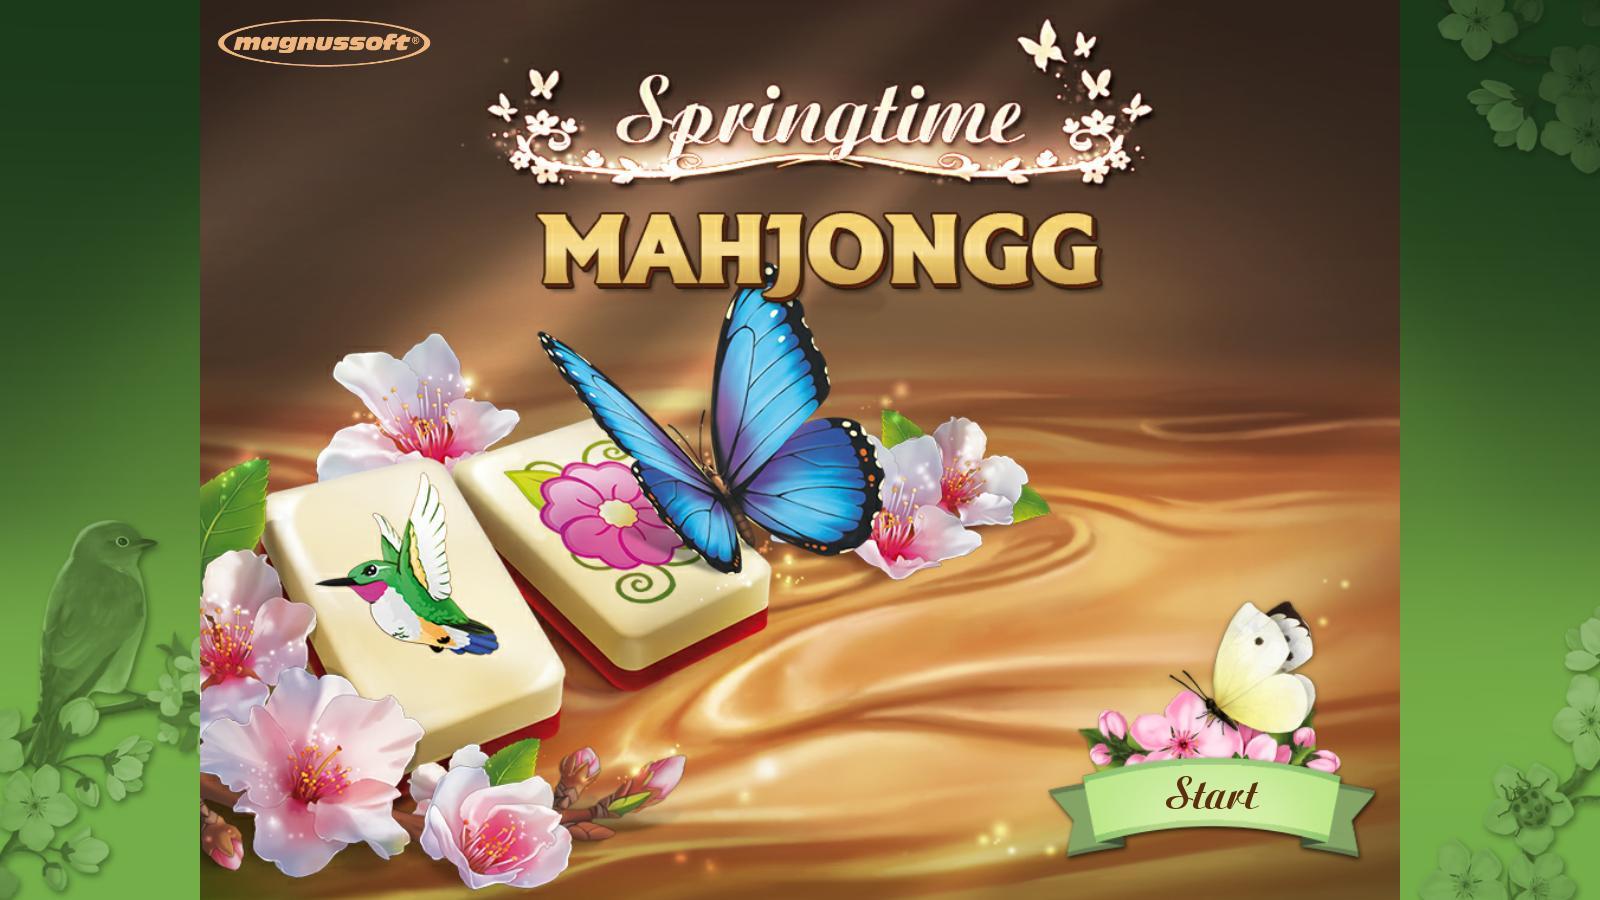 Весенний Маджонг | Springtime Mahjongg (En)